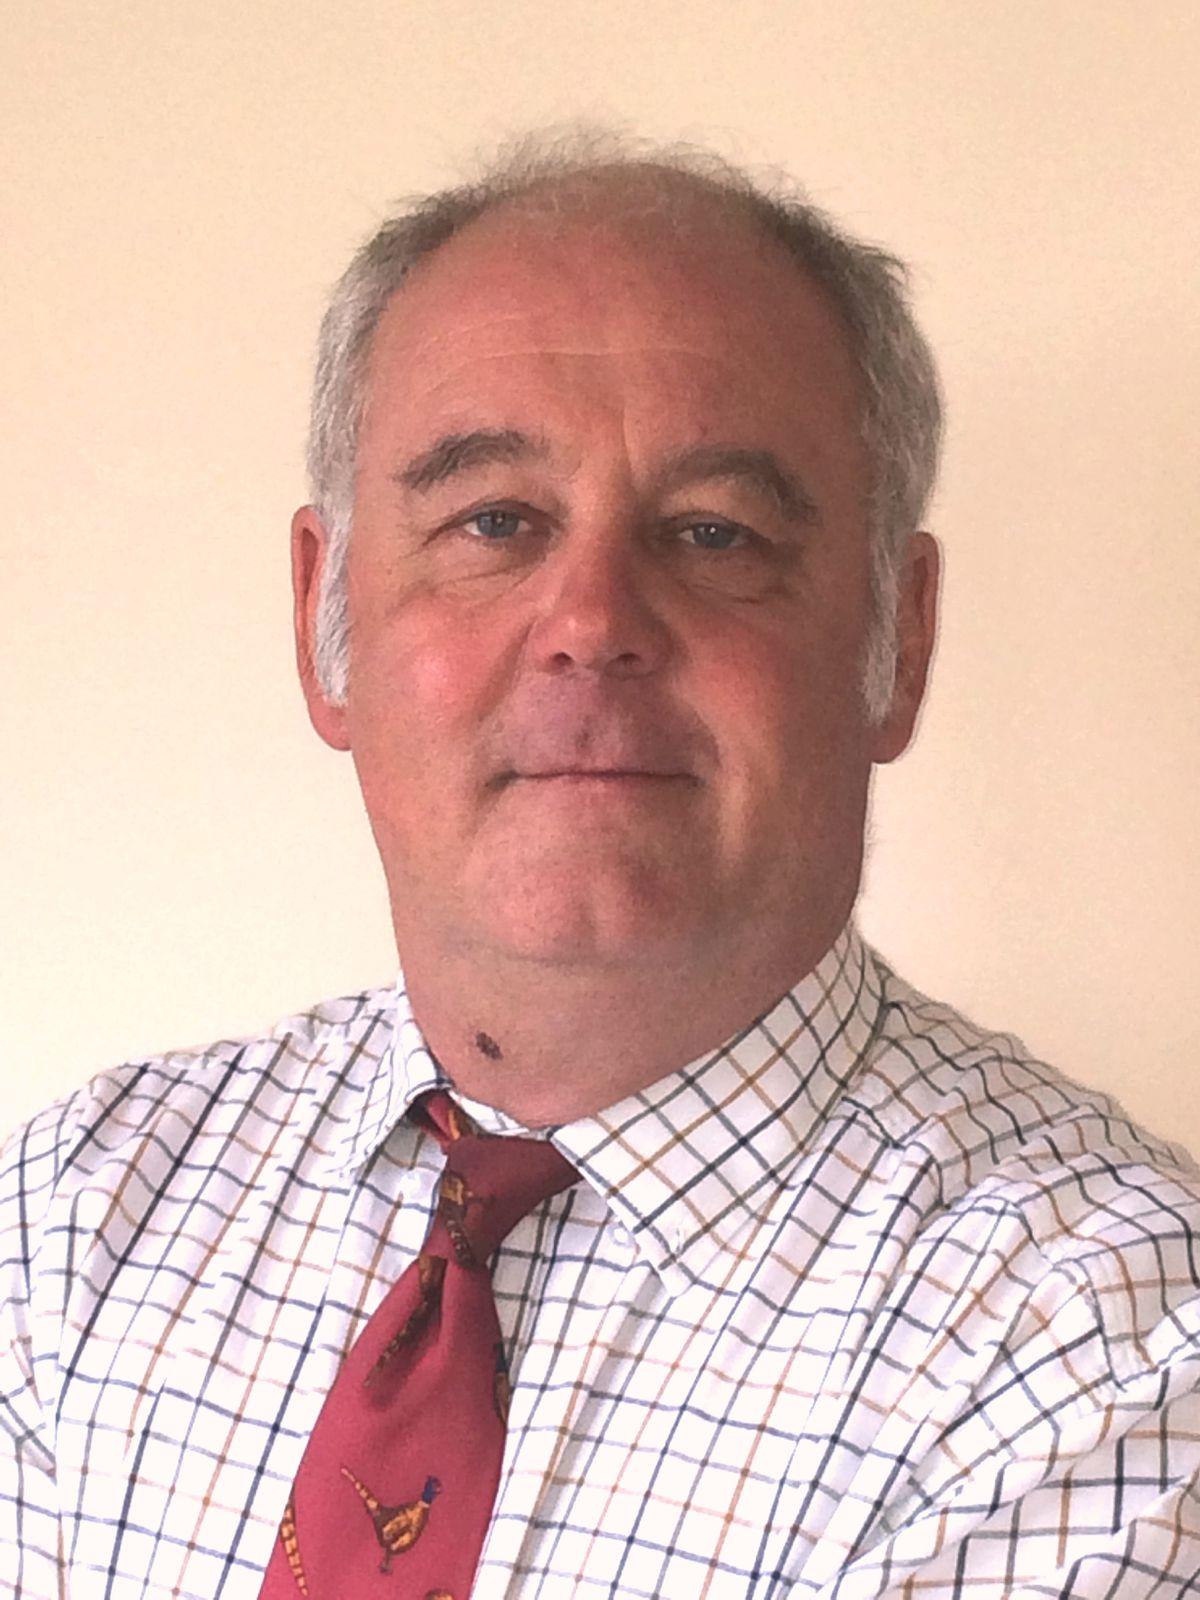 David Roberts, G O Davies (Westbury) Ltd grain merchants